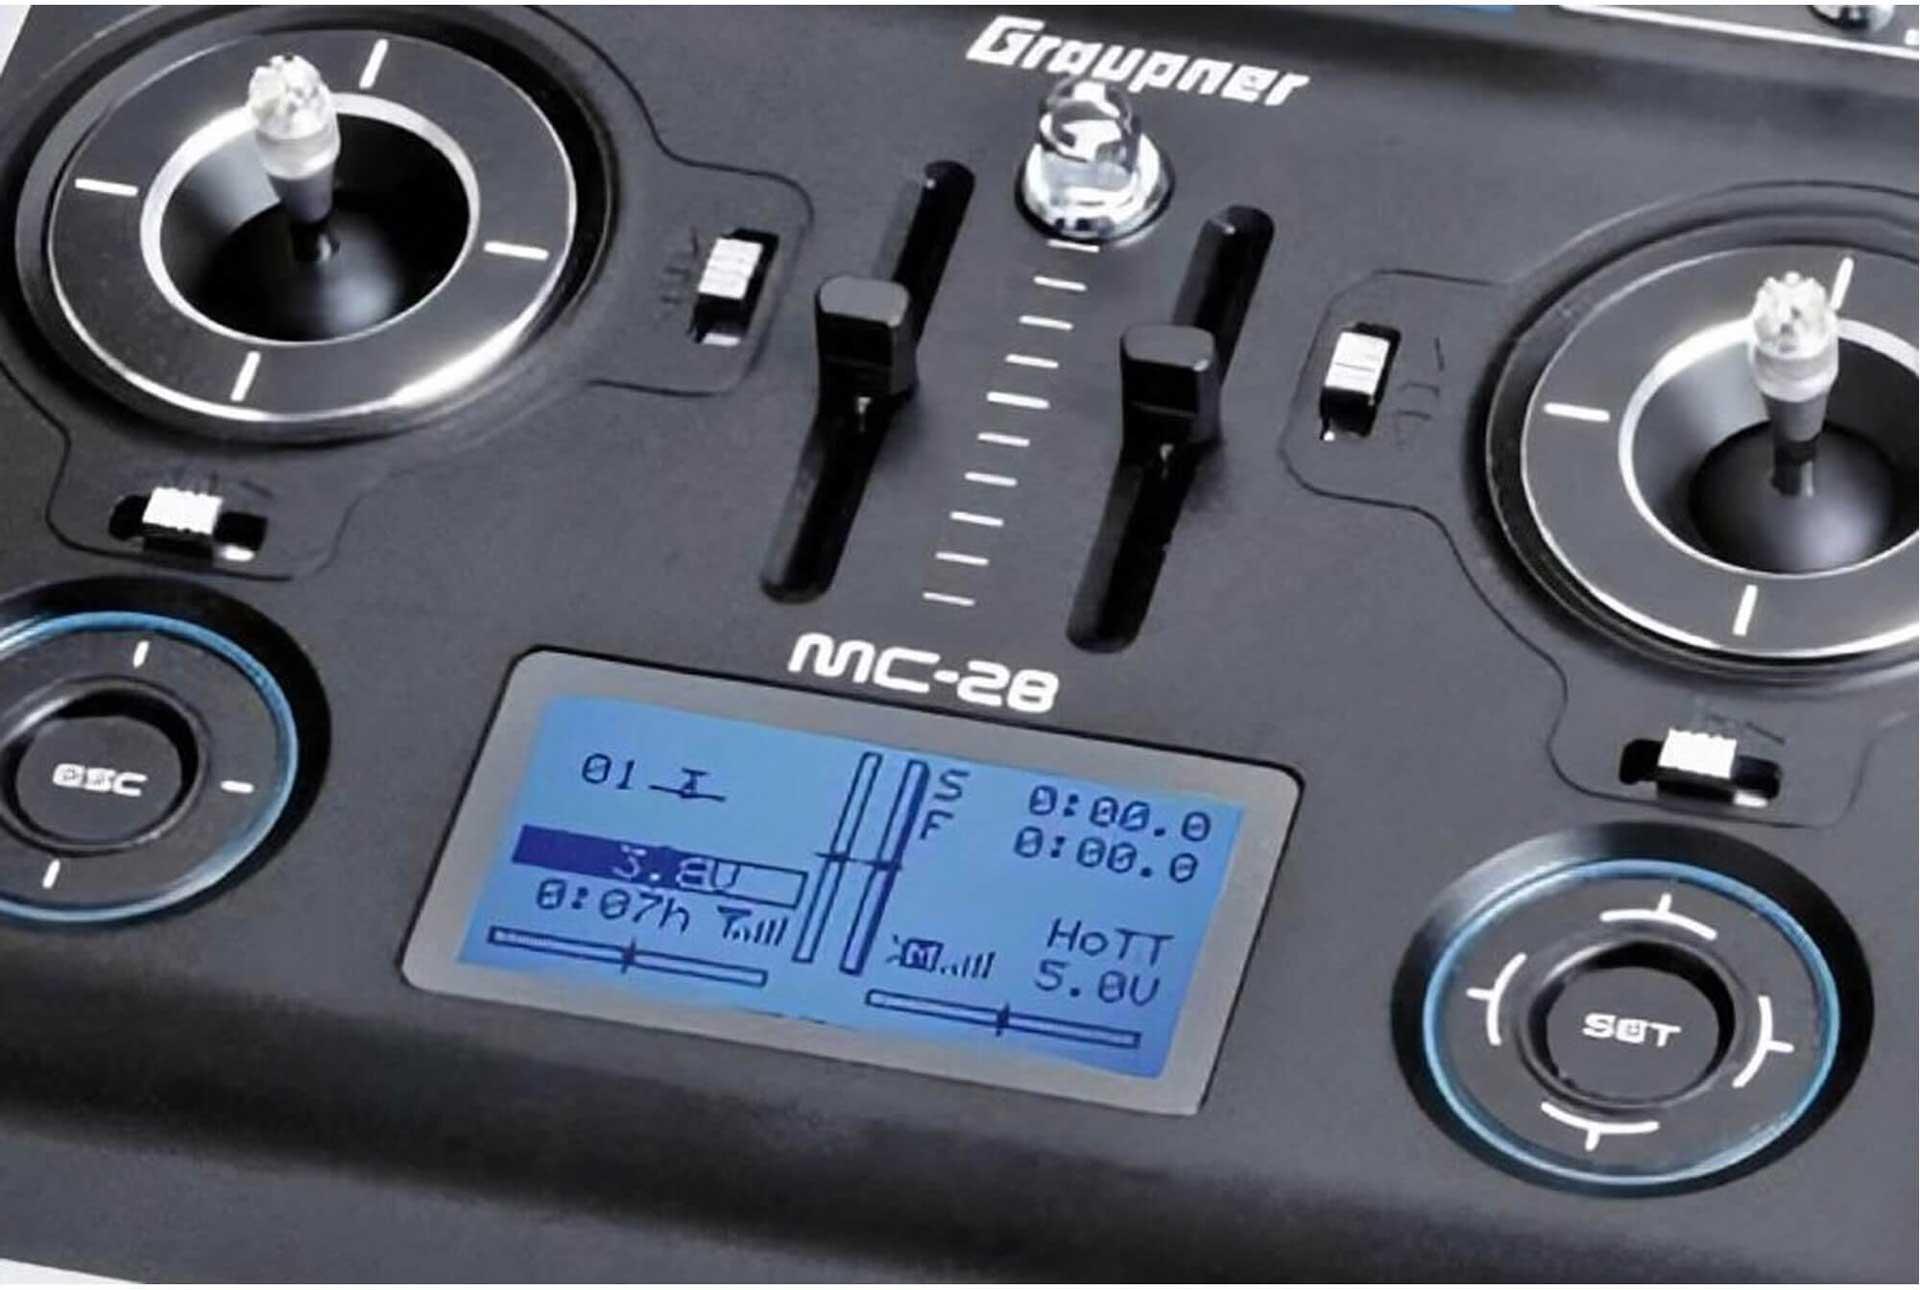 GRAUPNER MC-28 HOTT SINGLE TRANSMITTER REMOTE CONTROL